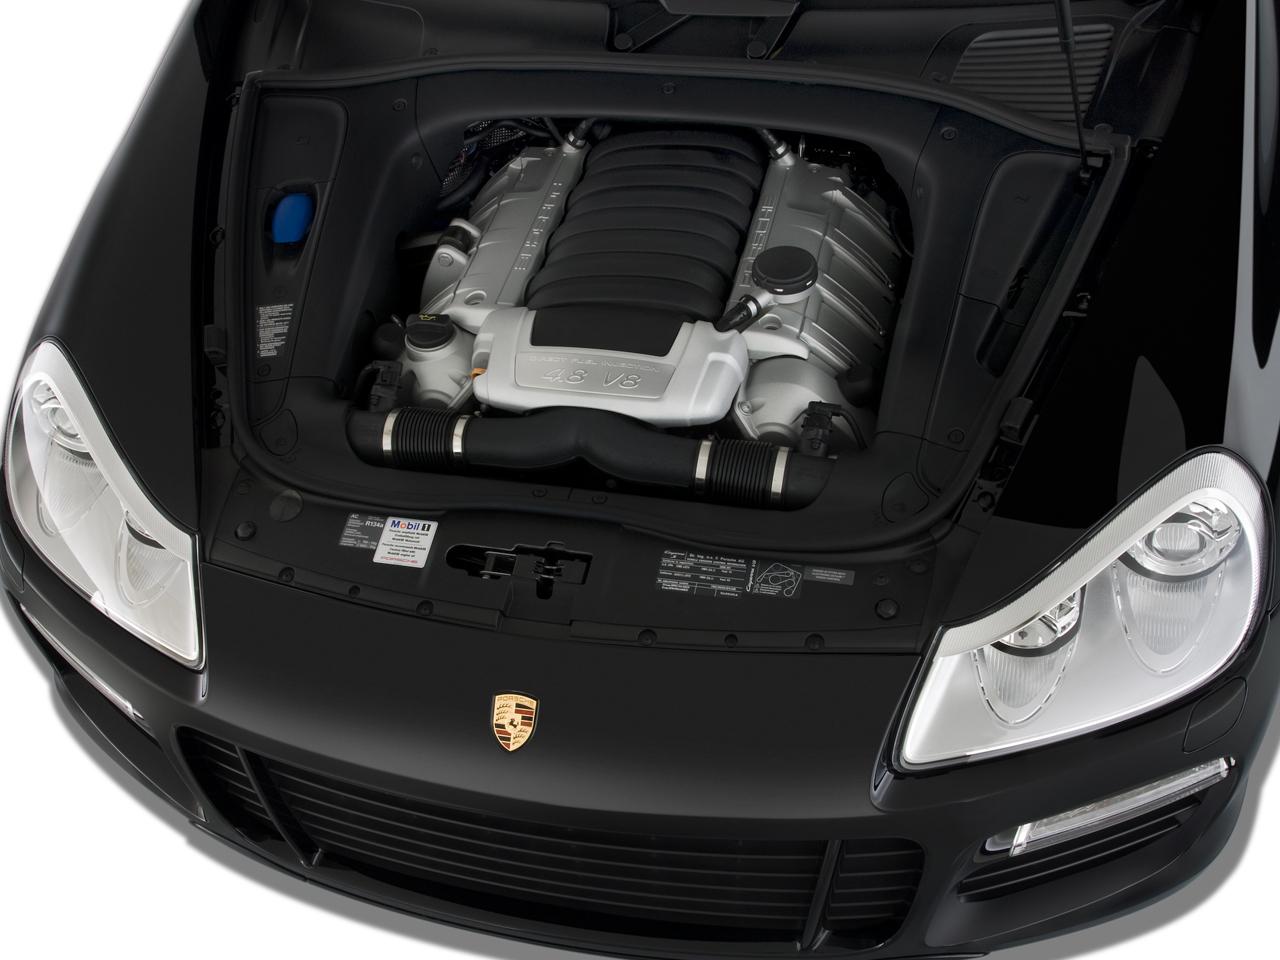 2008 porsche cayenne gts porsche sports suv automobile. Black Bedroom Furniture Sets. Home Design Ideas